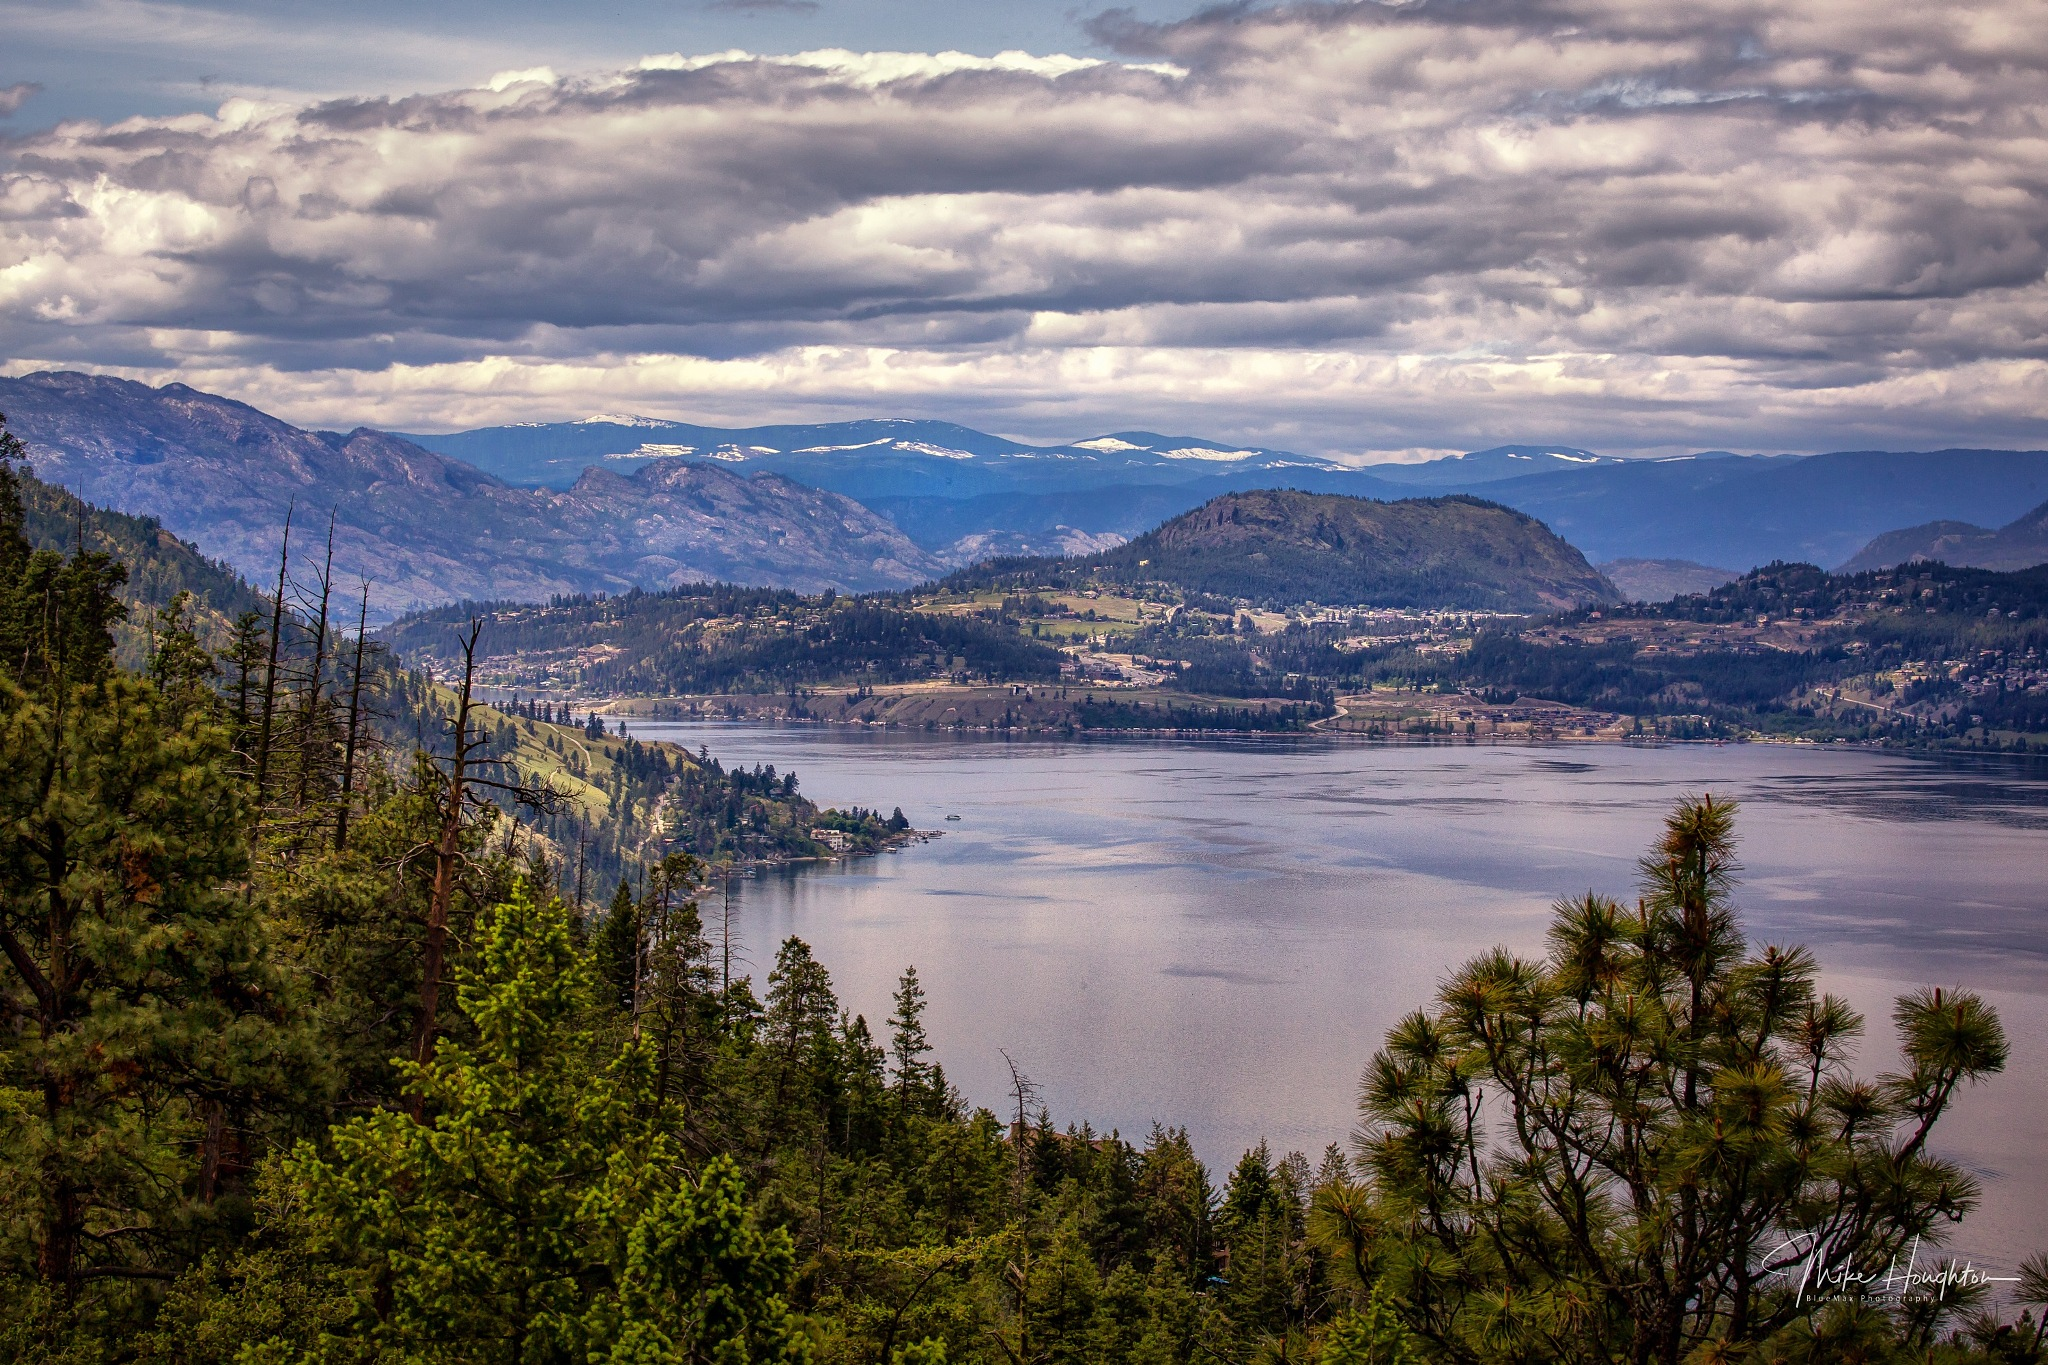 Lake Okanagan looking towards West Kelowna. by BlueMax Photography